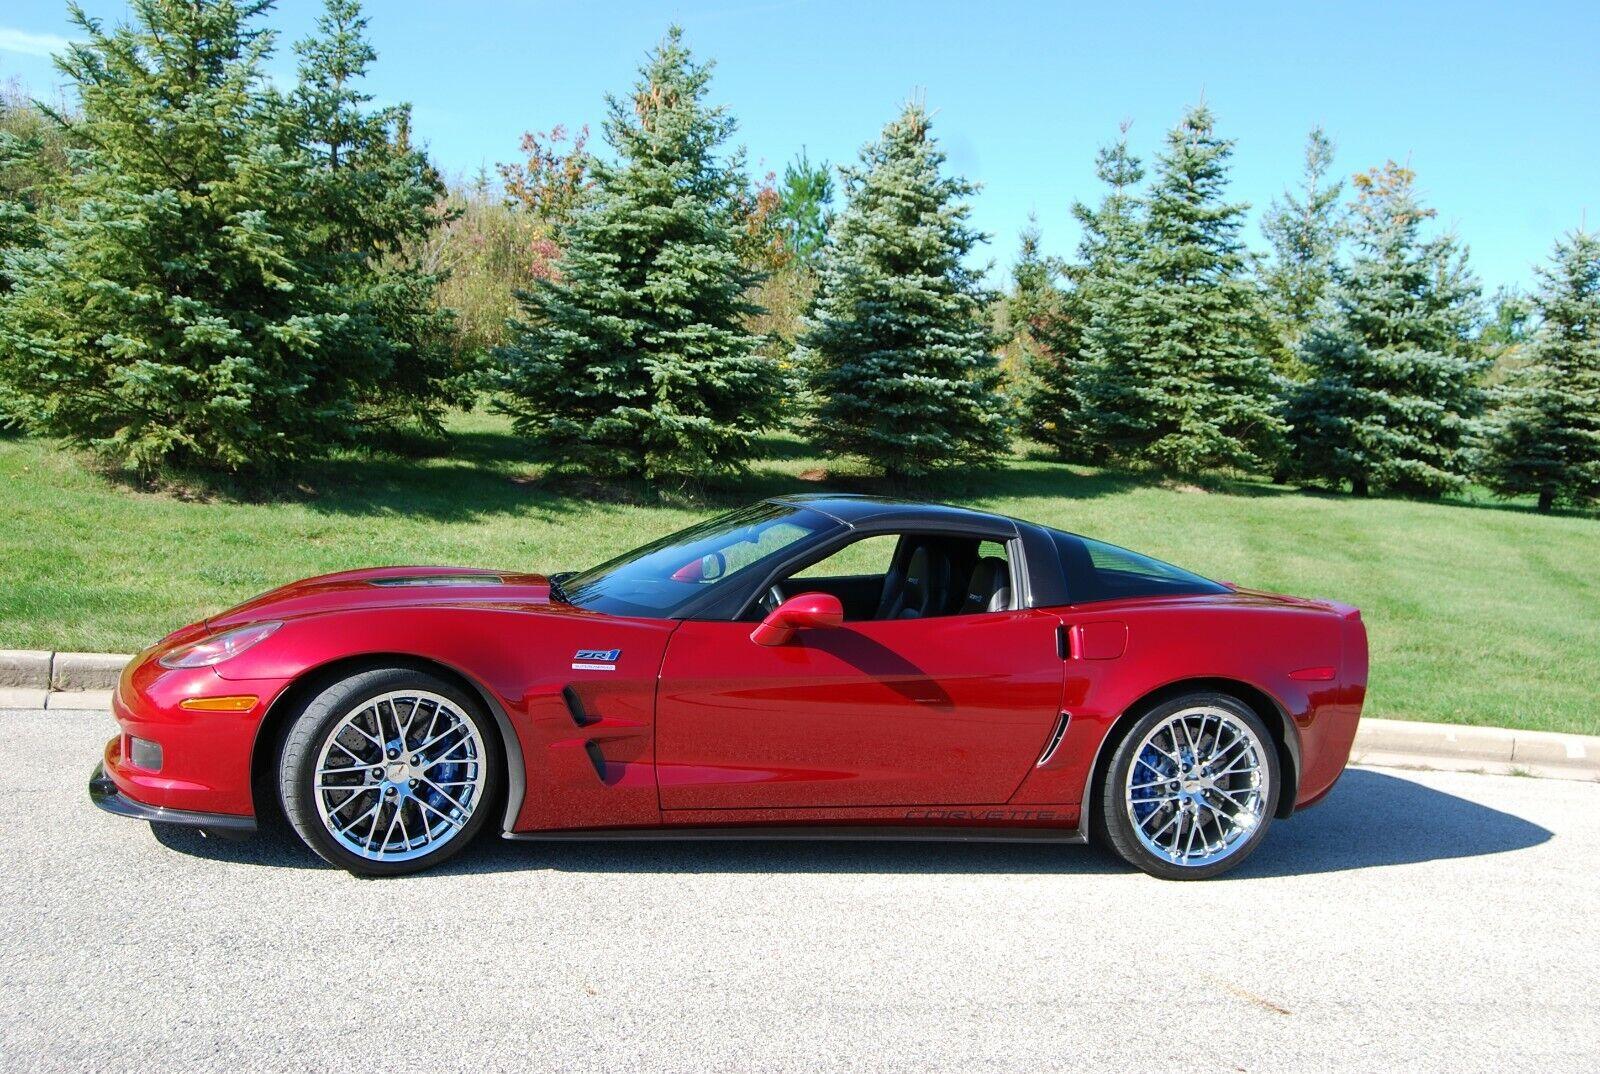 2010 Ebony Chevrolet Corvette ZR1 3ZR   C6 Corvette Photo 1